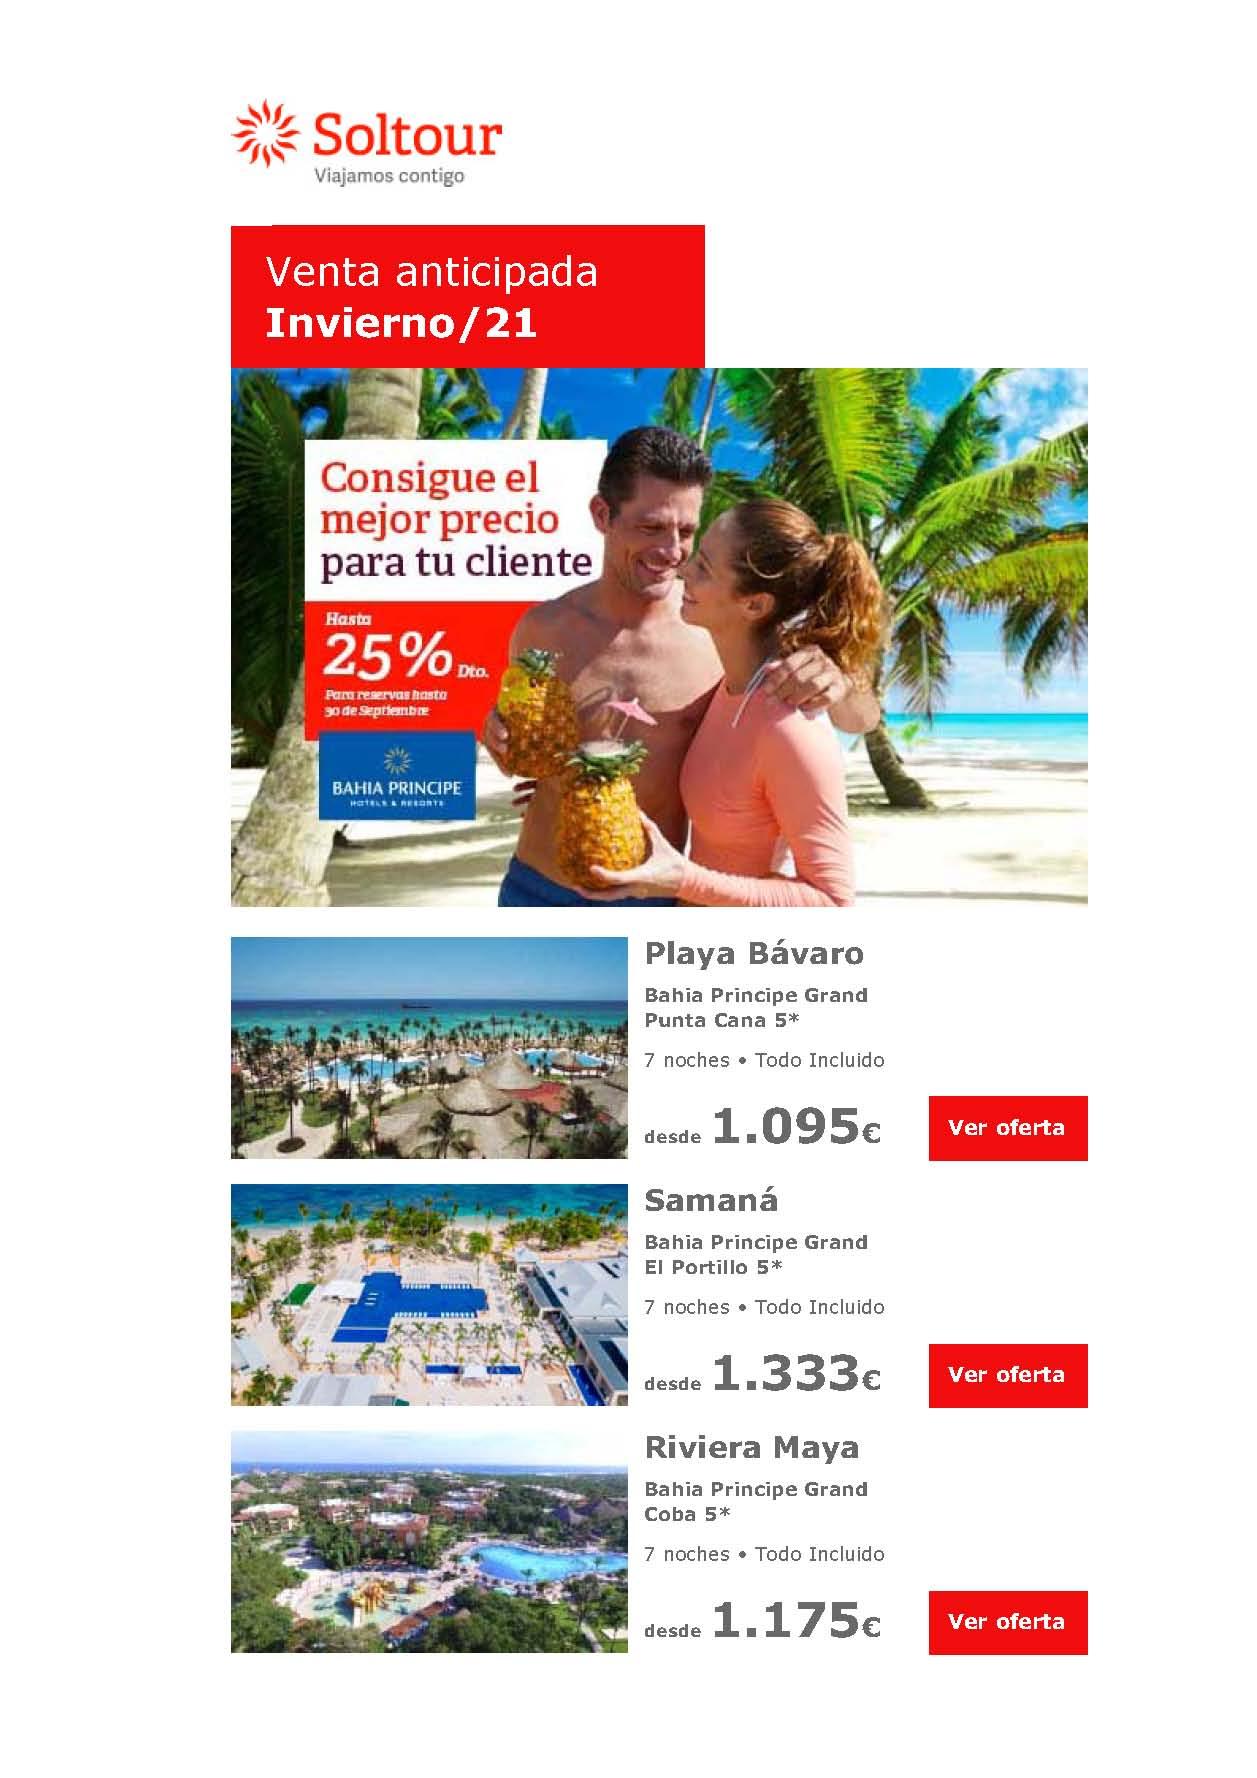 P Ofertas Soltour Venta Anticipada Bahia Principe Caribe y Tenerife Otono-Invierno 2021